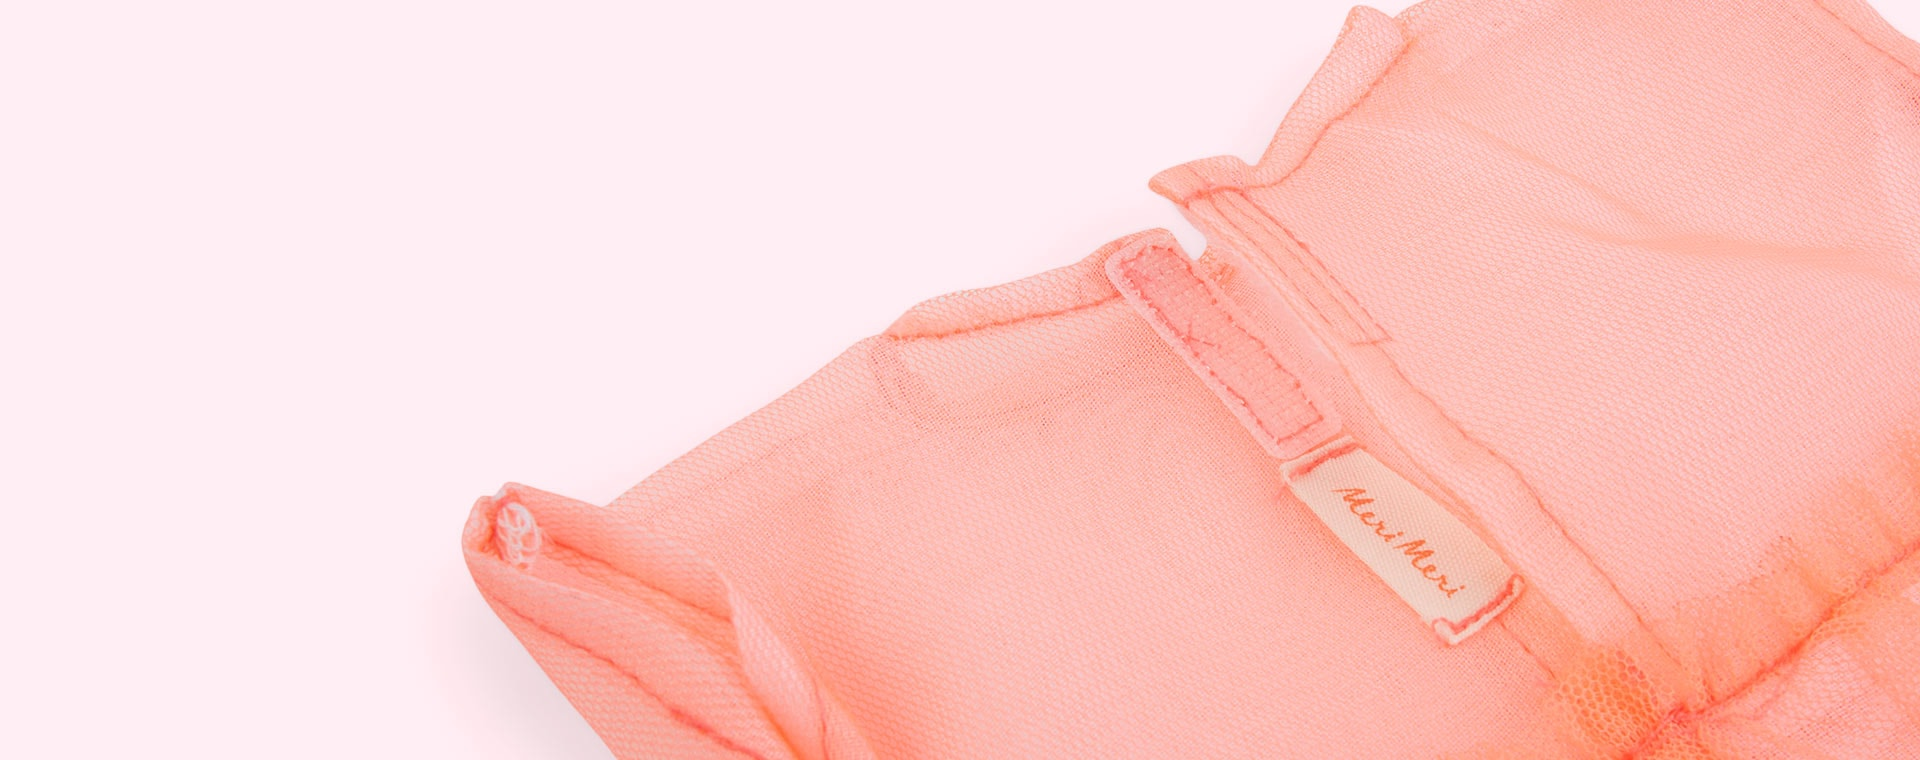 Pink Meri Meri Flower Dolly Dress Up